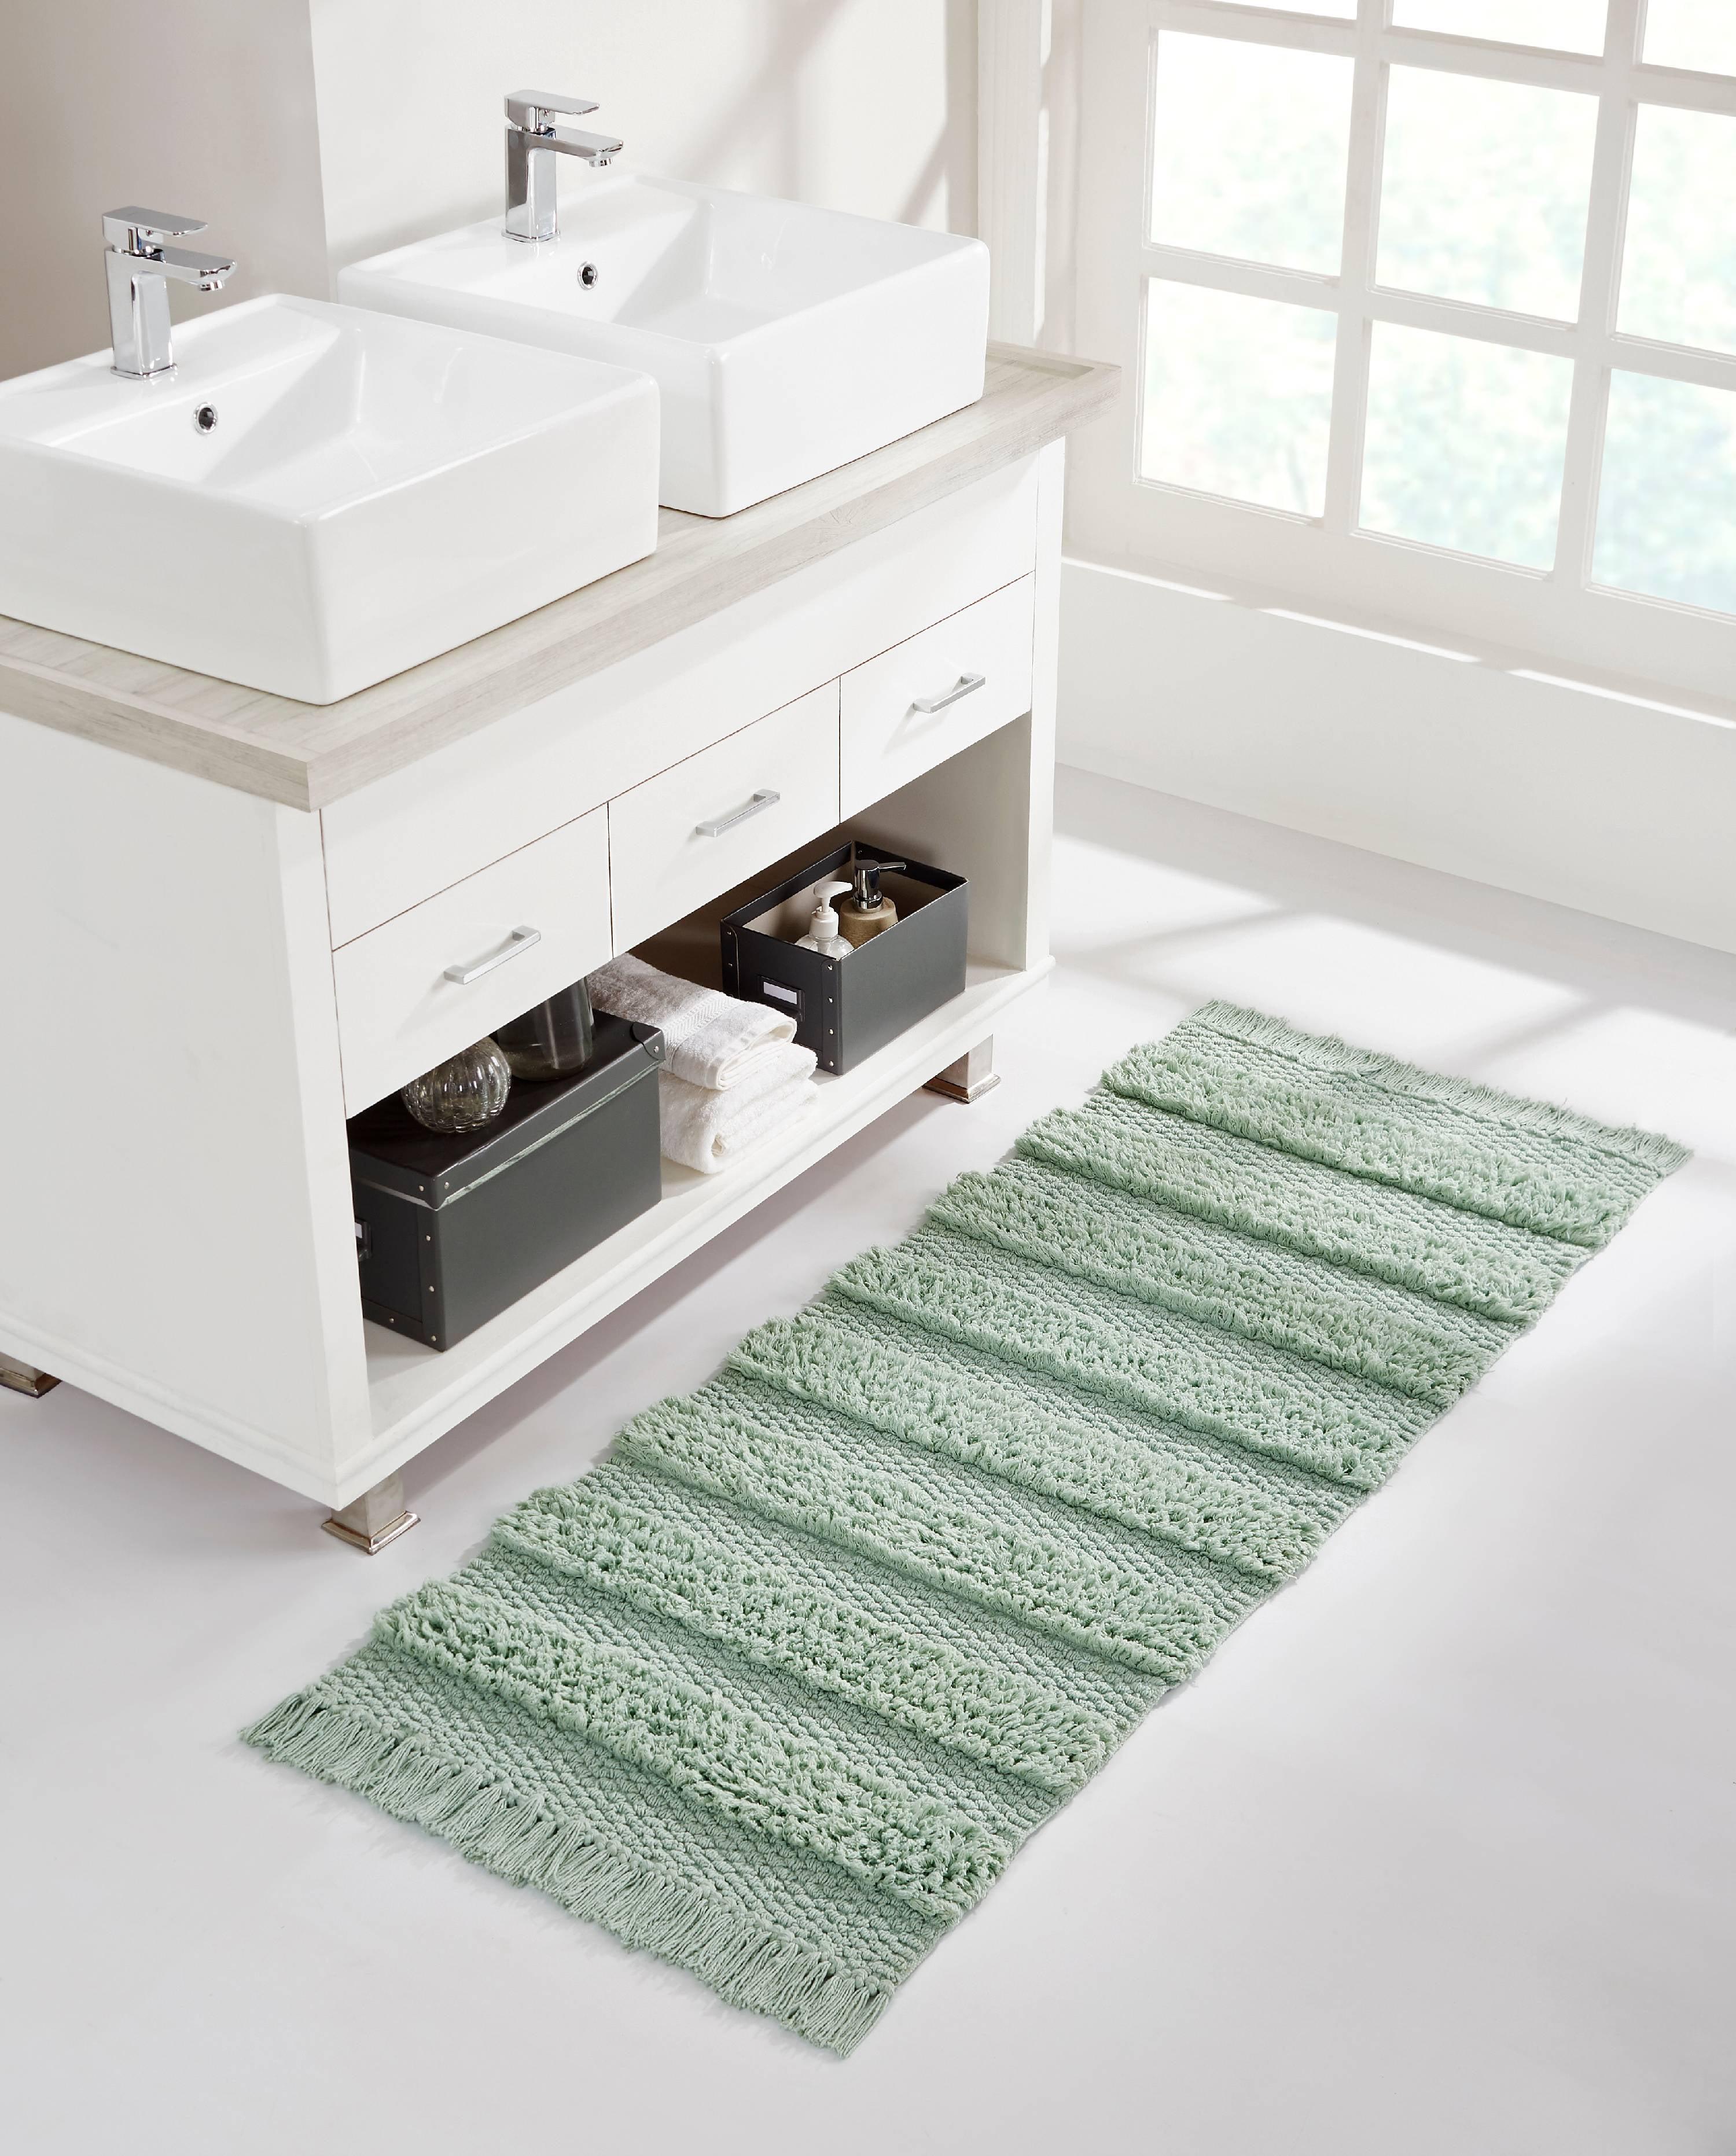 VCNY Home Savannah Fringe Stripe Cotton Blend Bath Rug Runner, 20 x 20,  Green